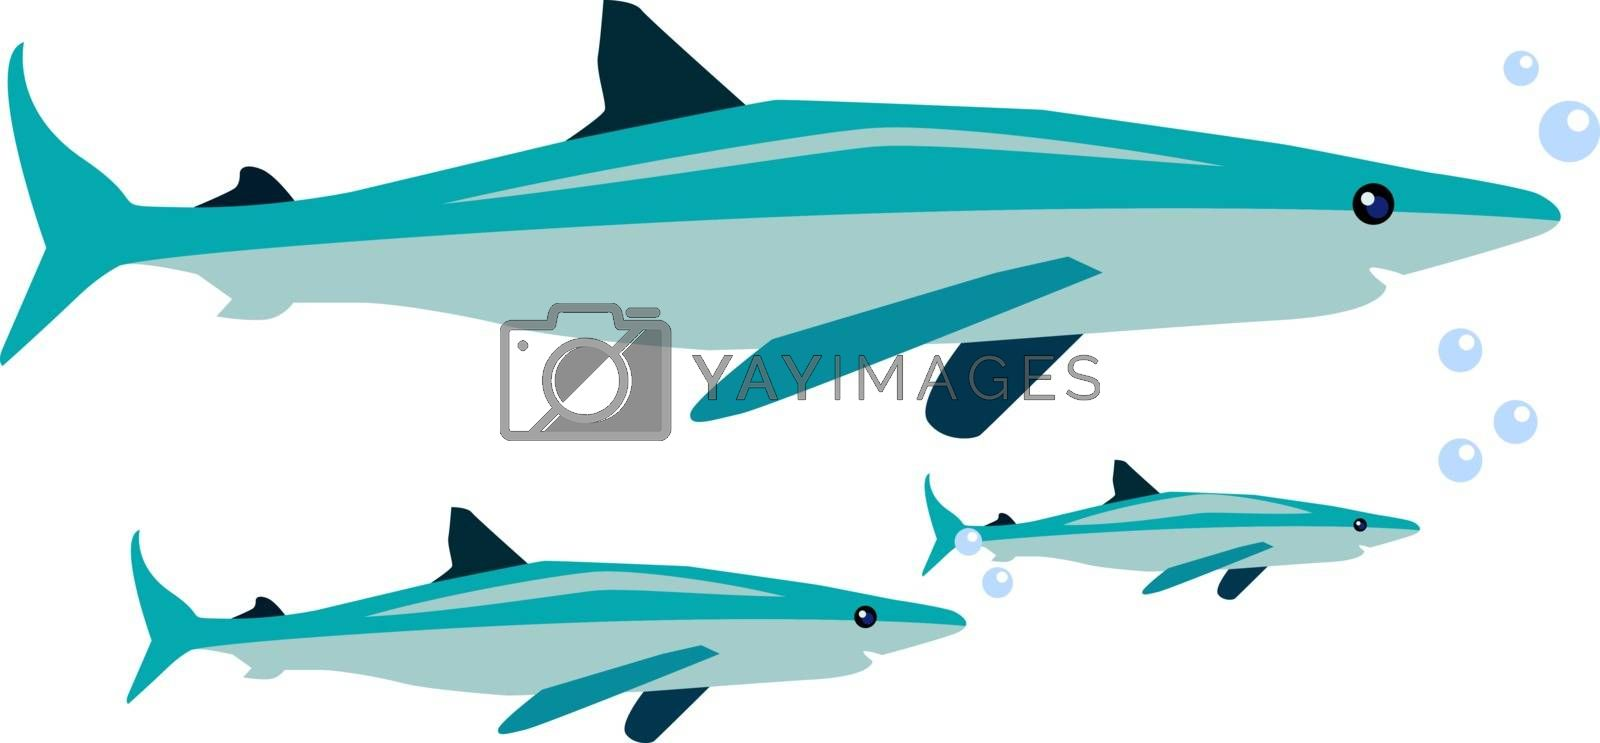 Sharks under sea, illustration, vector on white background.